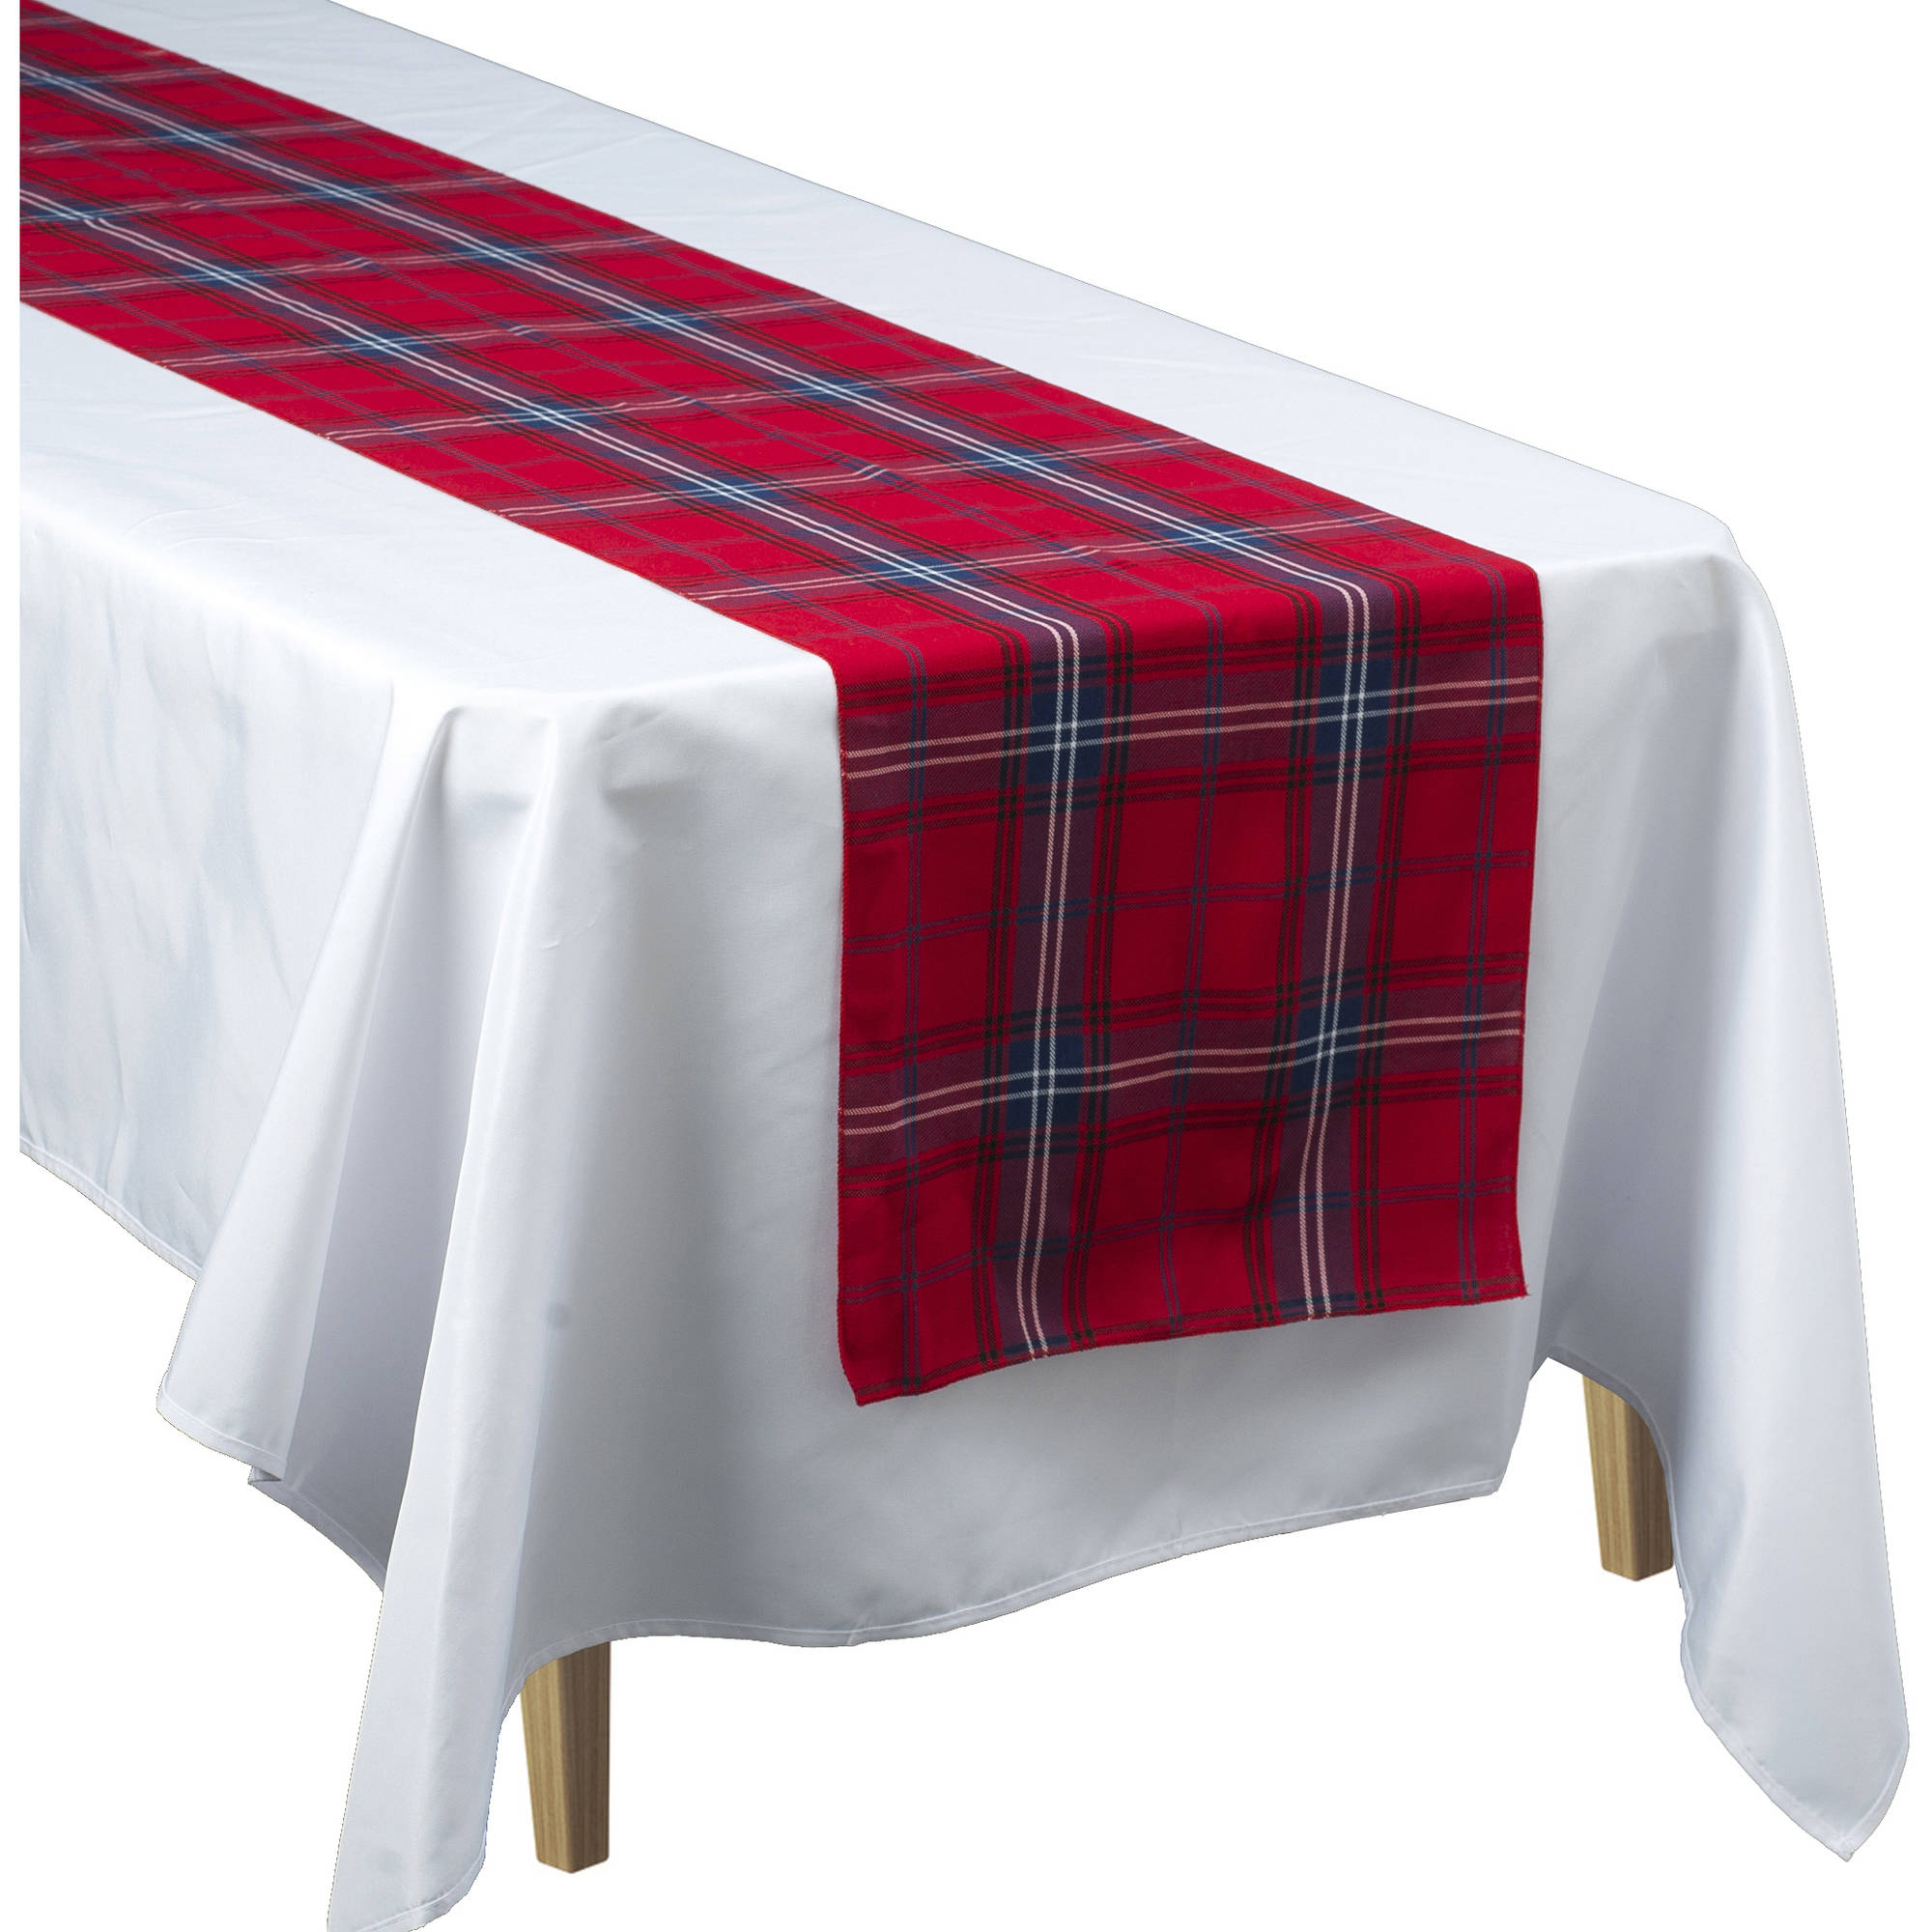 Tartan Plaid Table Runner